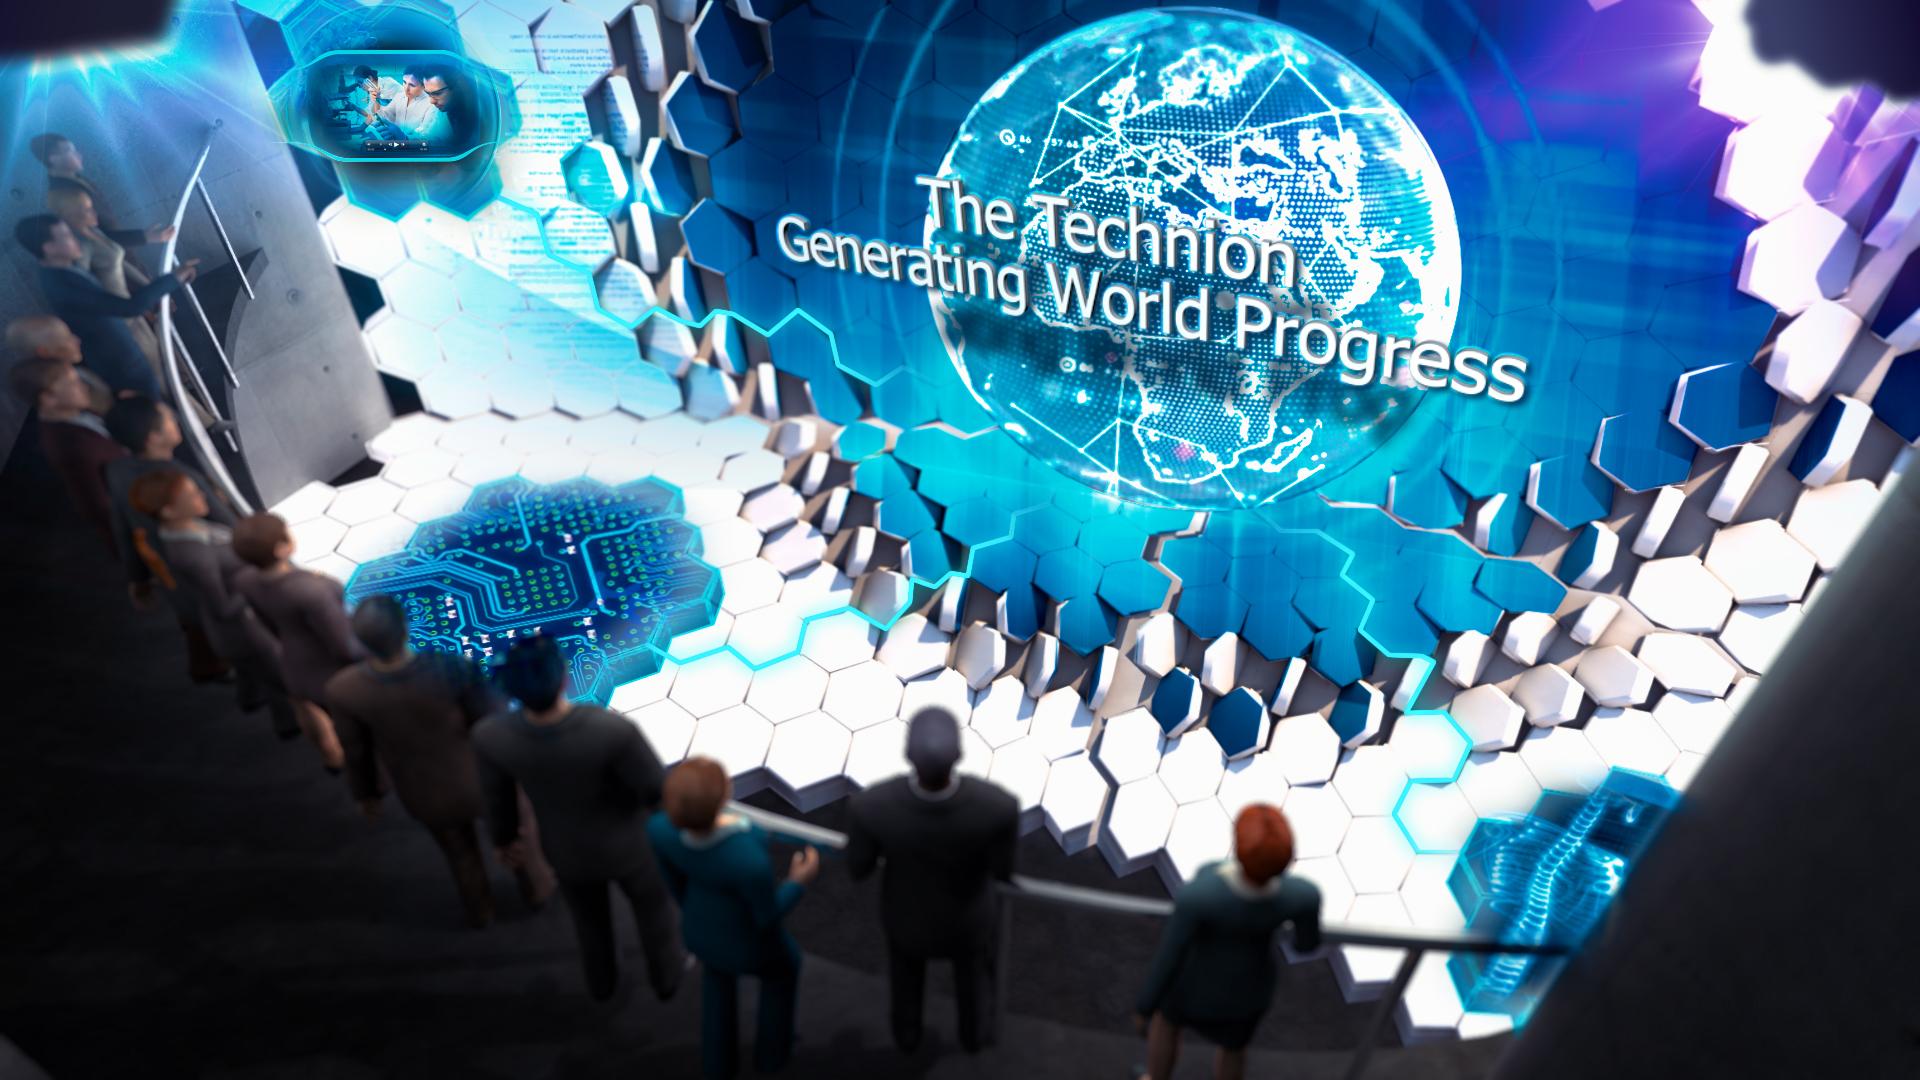 Technion 2016